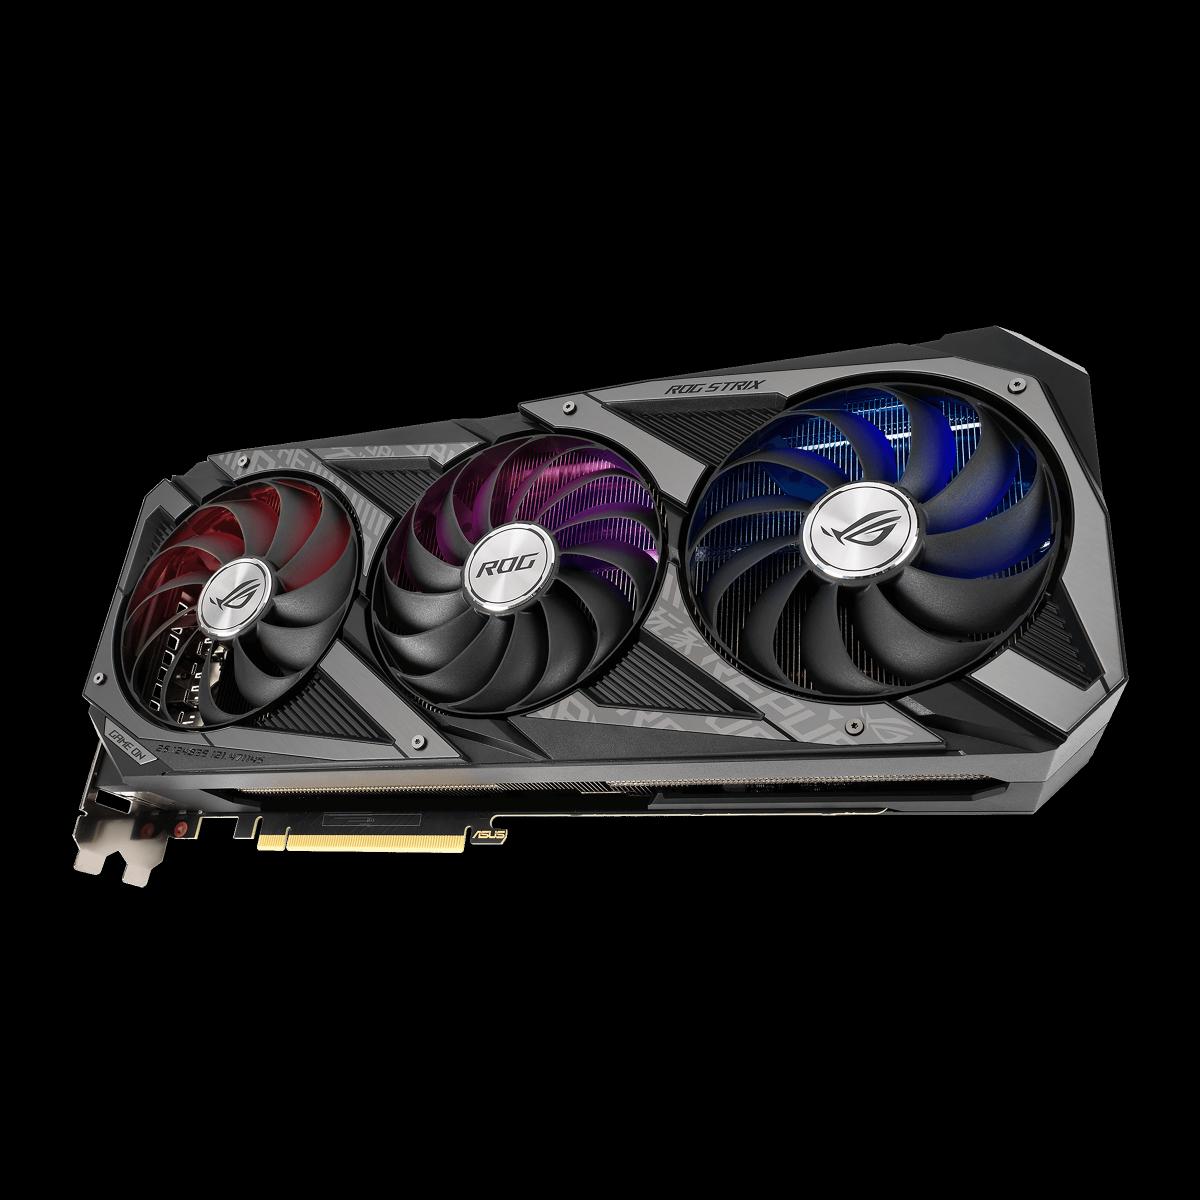 Placa de Vídeo Asus, ROG Strix, Geforce RTX 3060 Ti, 8GB, GDDR6, 256bit, ROG-STRIX-RTX3060TI-O8G-GAMING